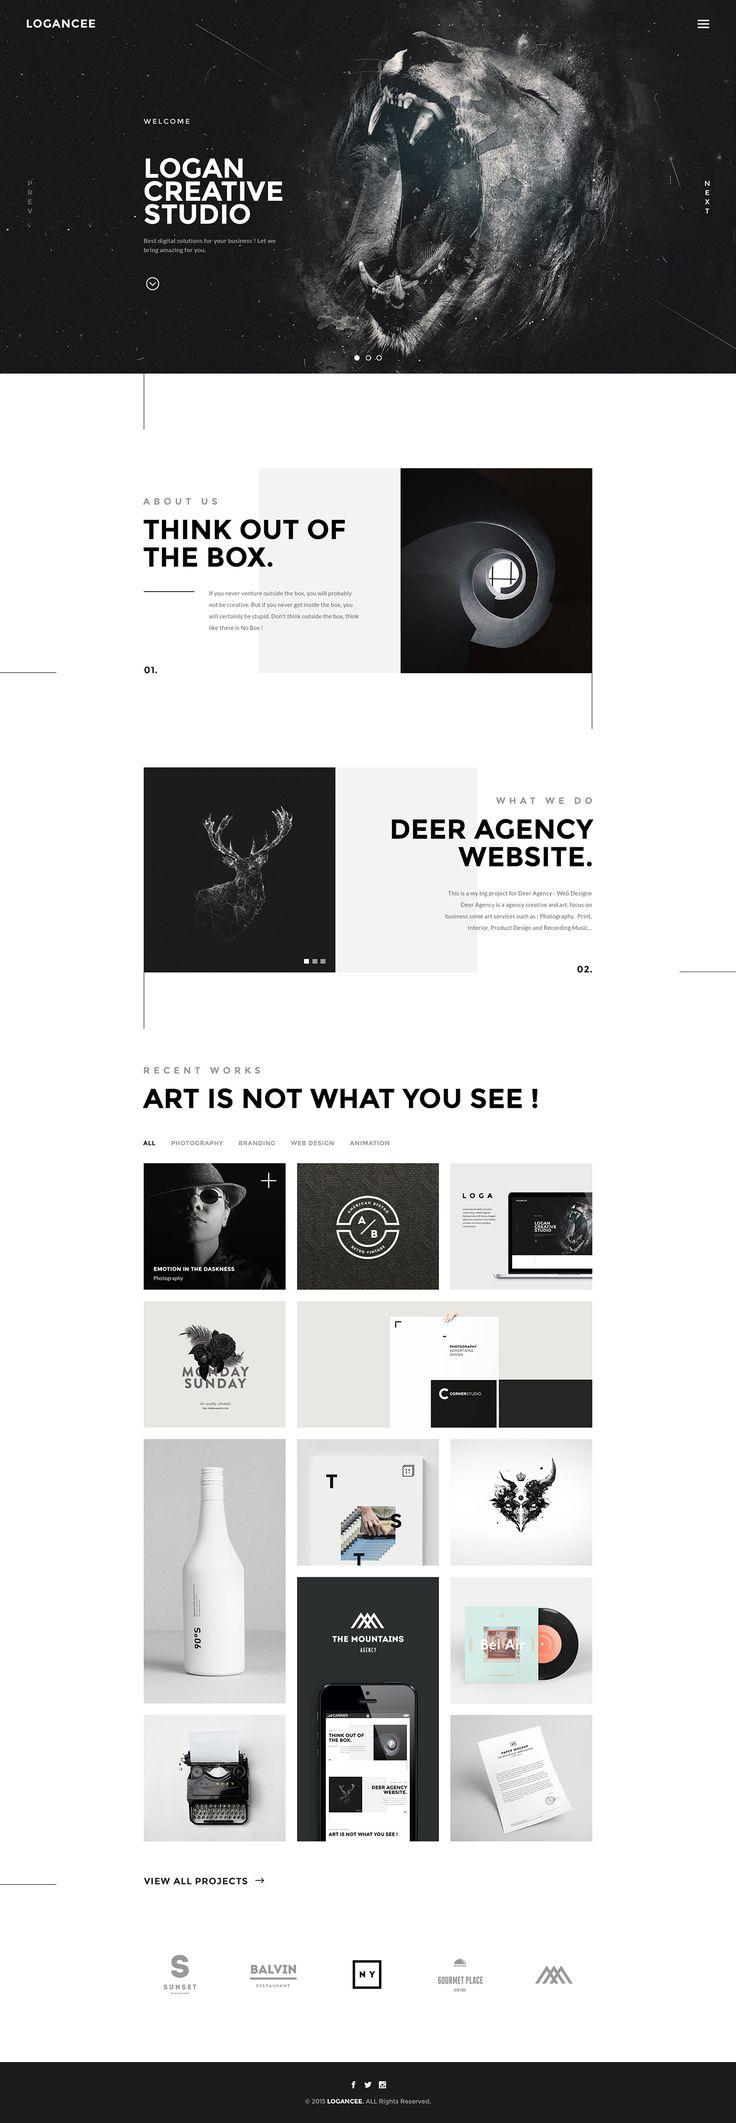 Logancee | Creative Studio Homepages on Behance